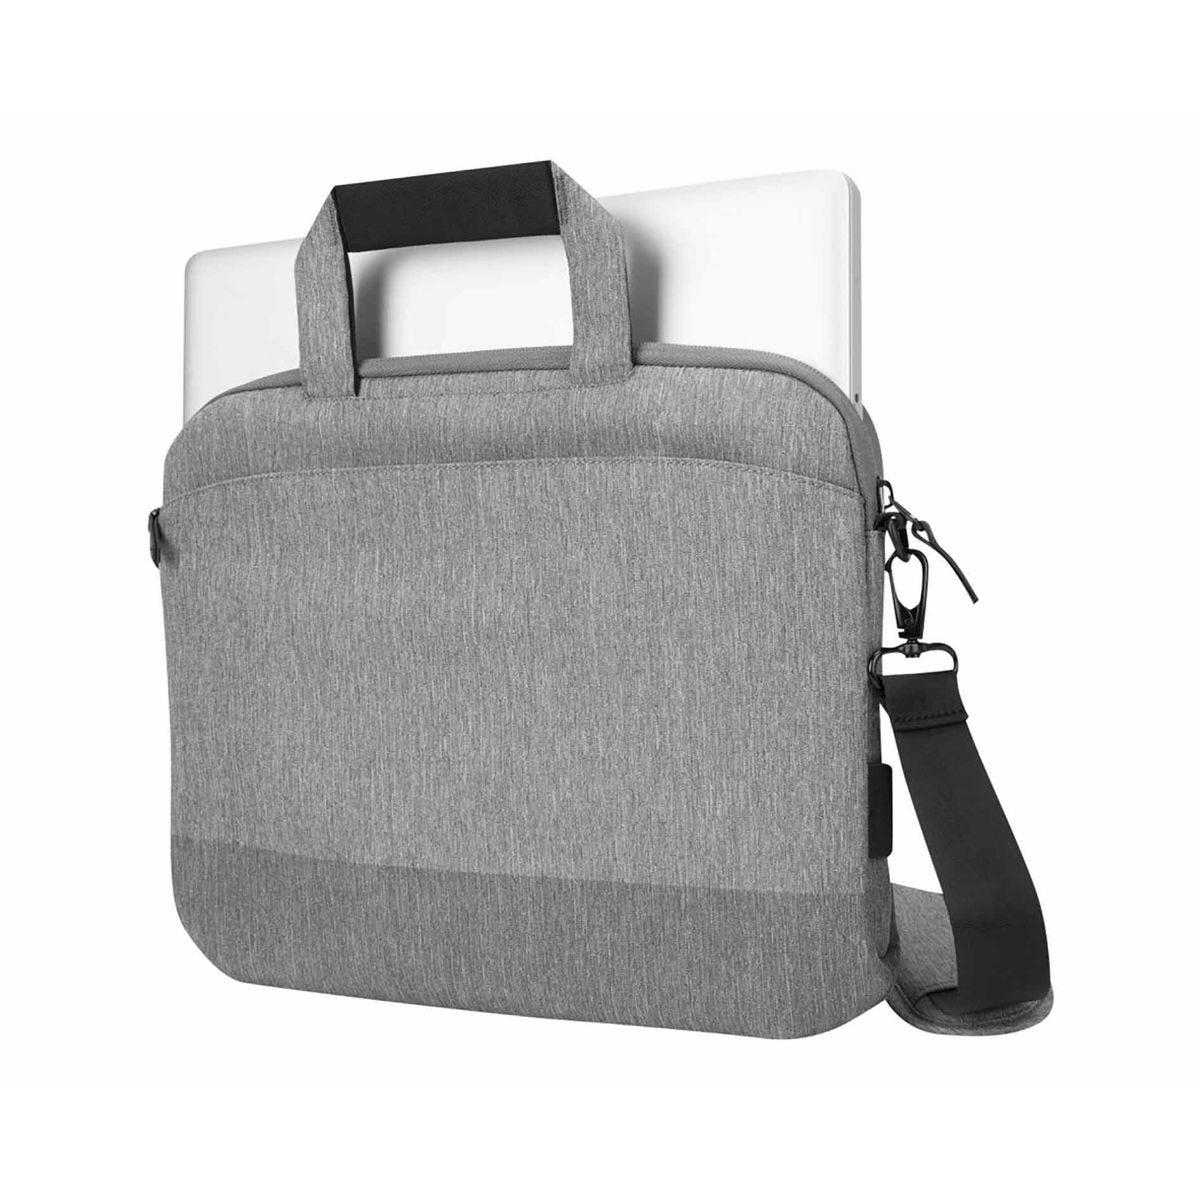 2a409e058f78 Buy Messenger Bags   Satchels